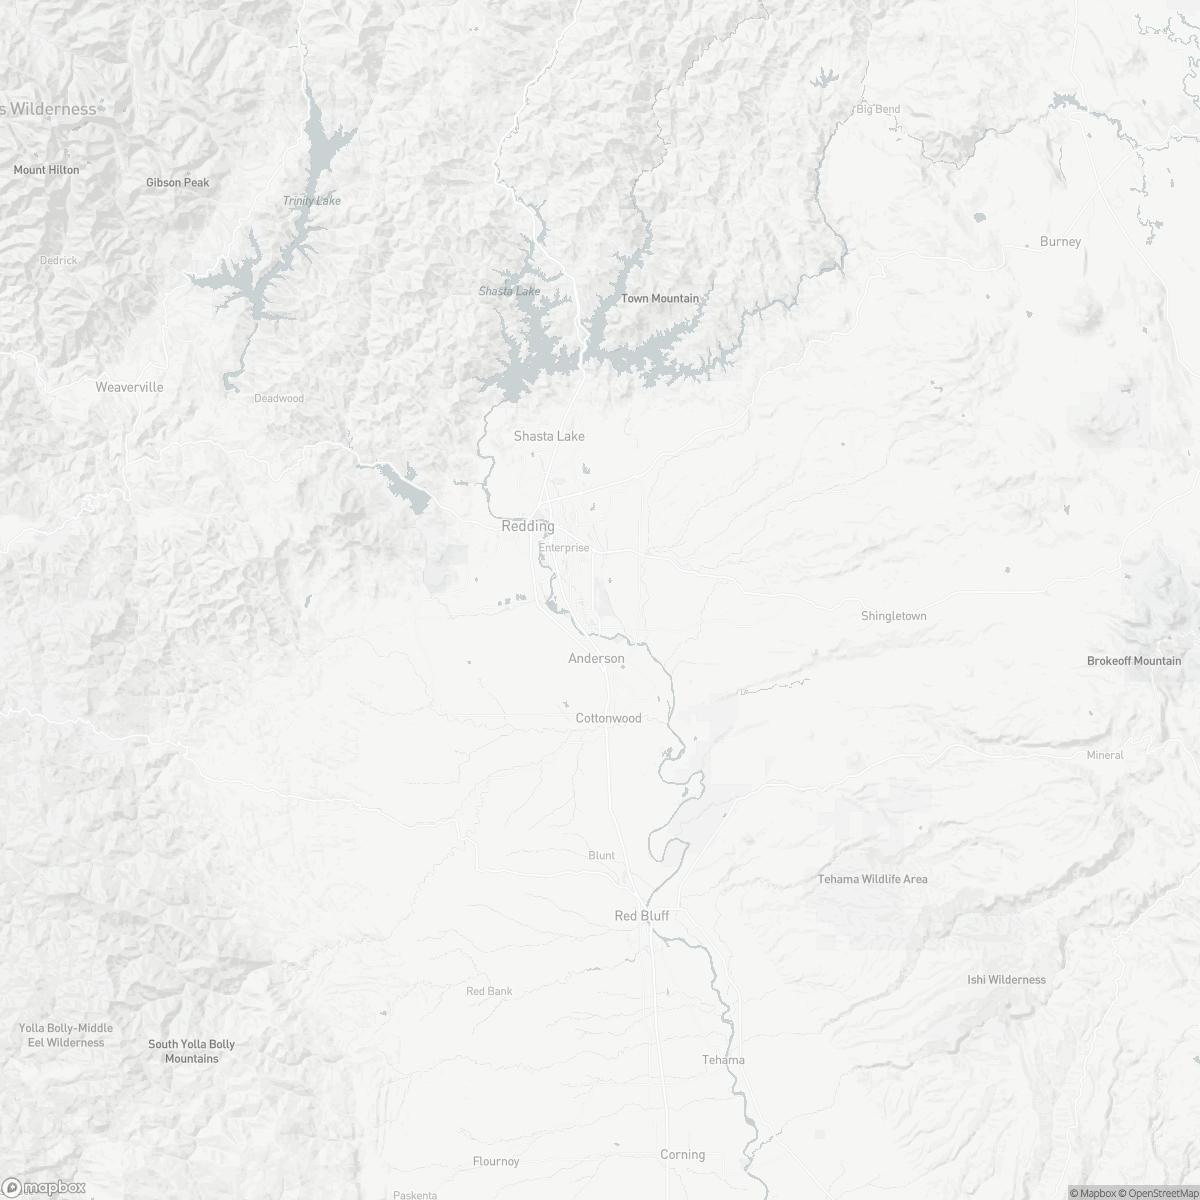 Map of Redding Municipal Airport RDD surrounding area of Redding California